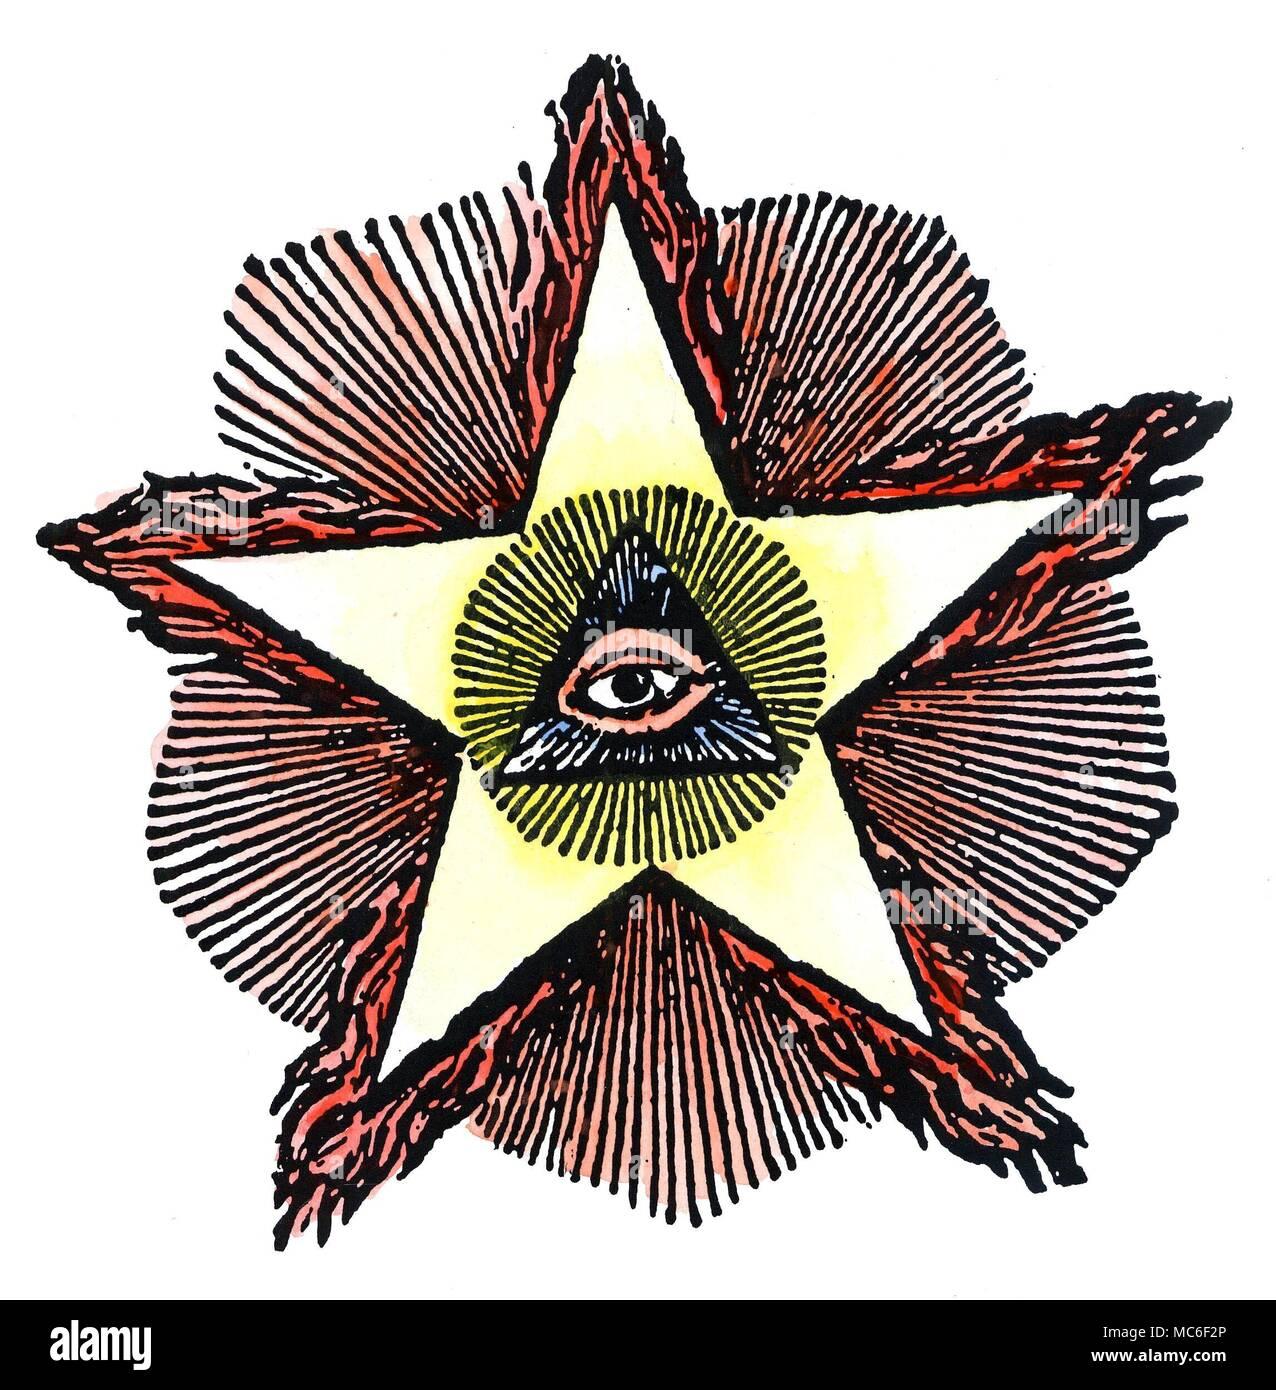 Masonry Symbols Blazing Star The Blazing Star Of Masonry This